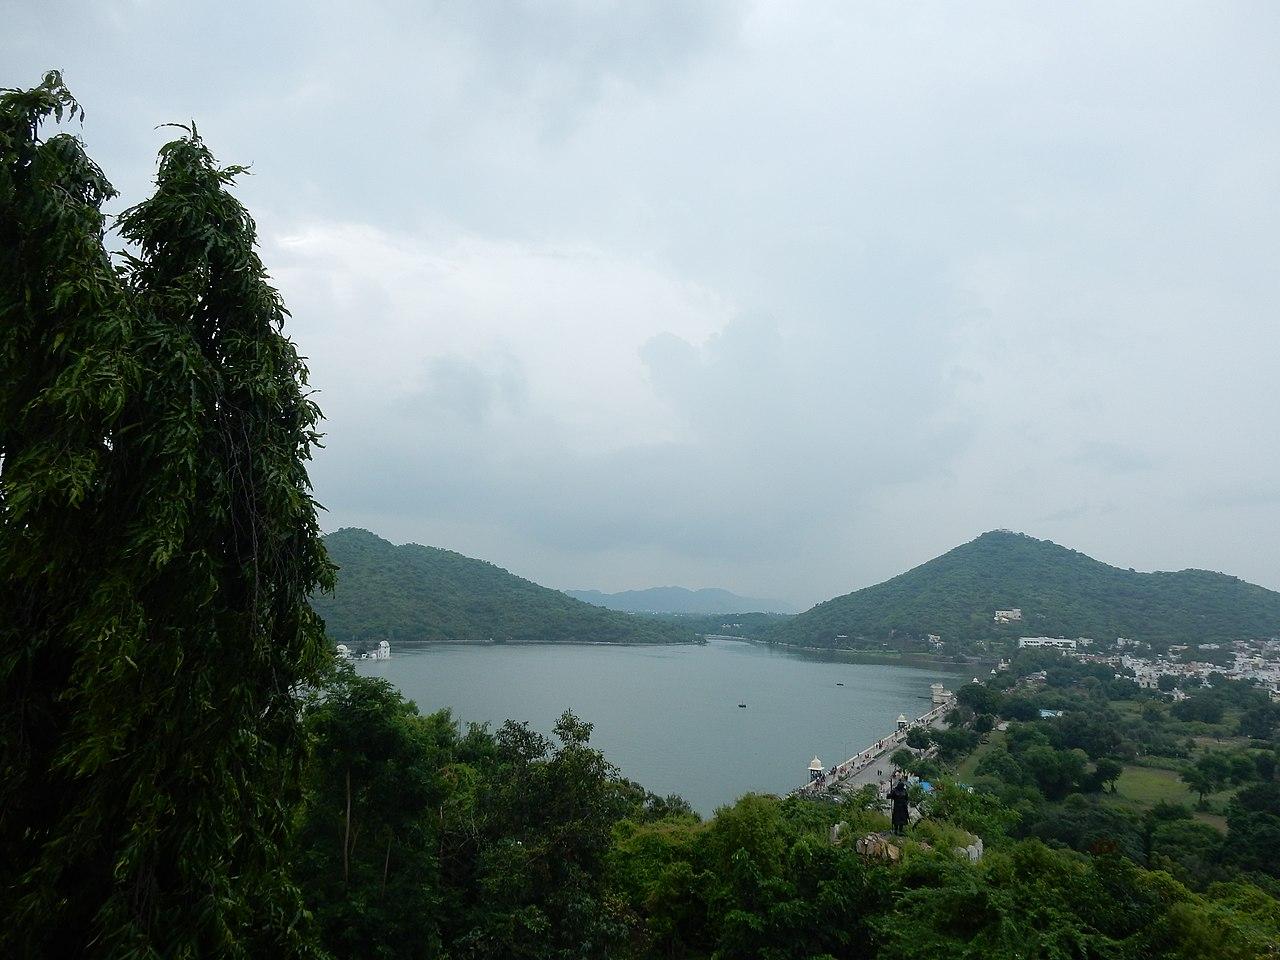 Incredible Lake That One Must-Visit in Rajasthan-Fateh Sagar Lake, Udaipur